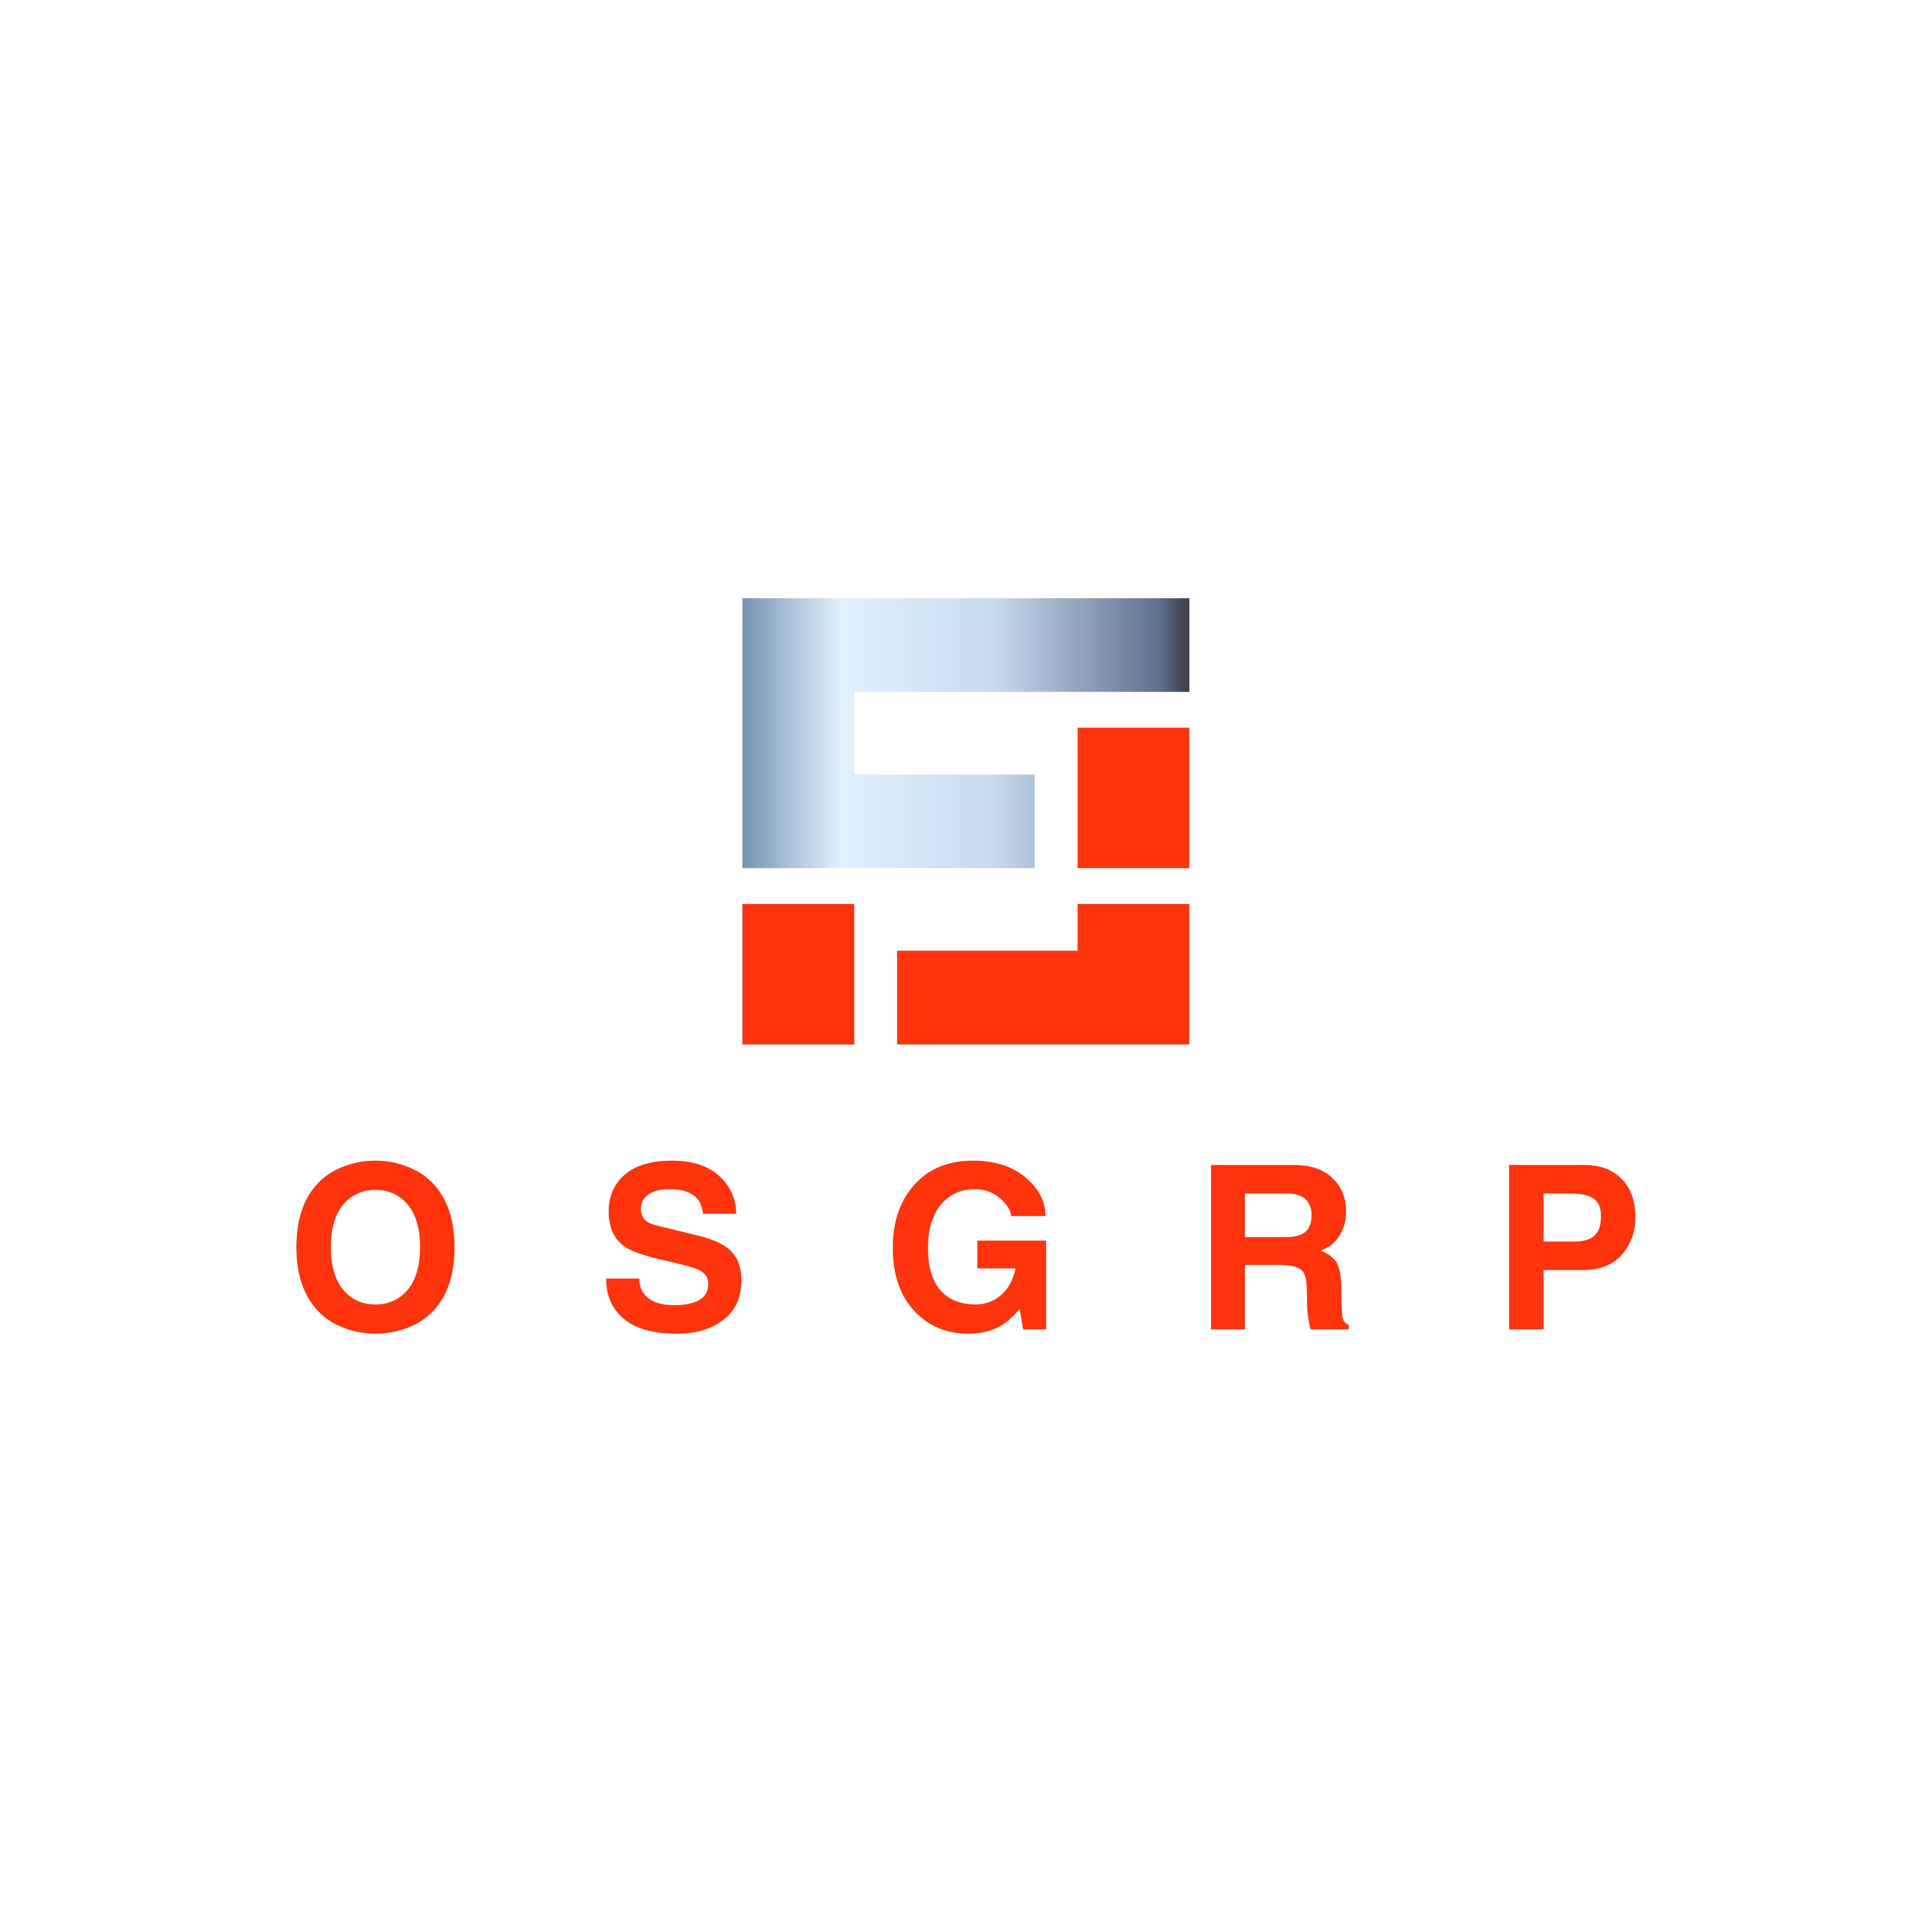 OSGRP-01